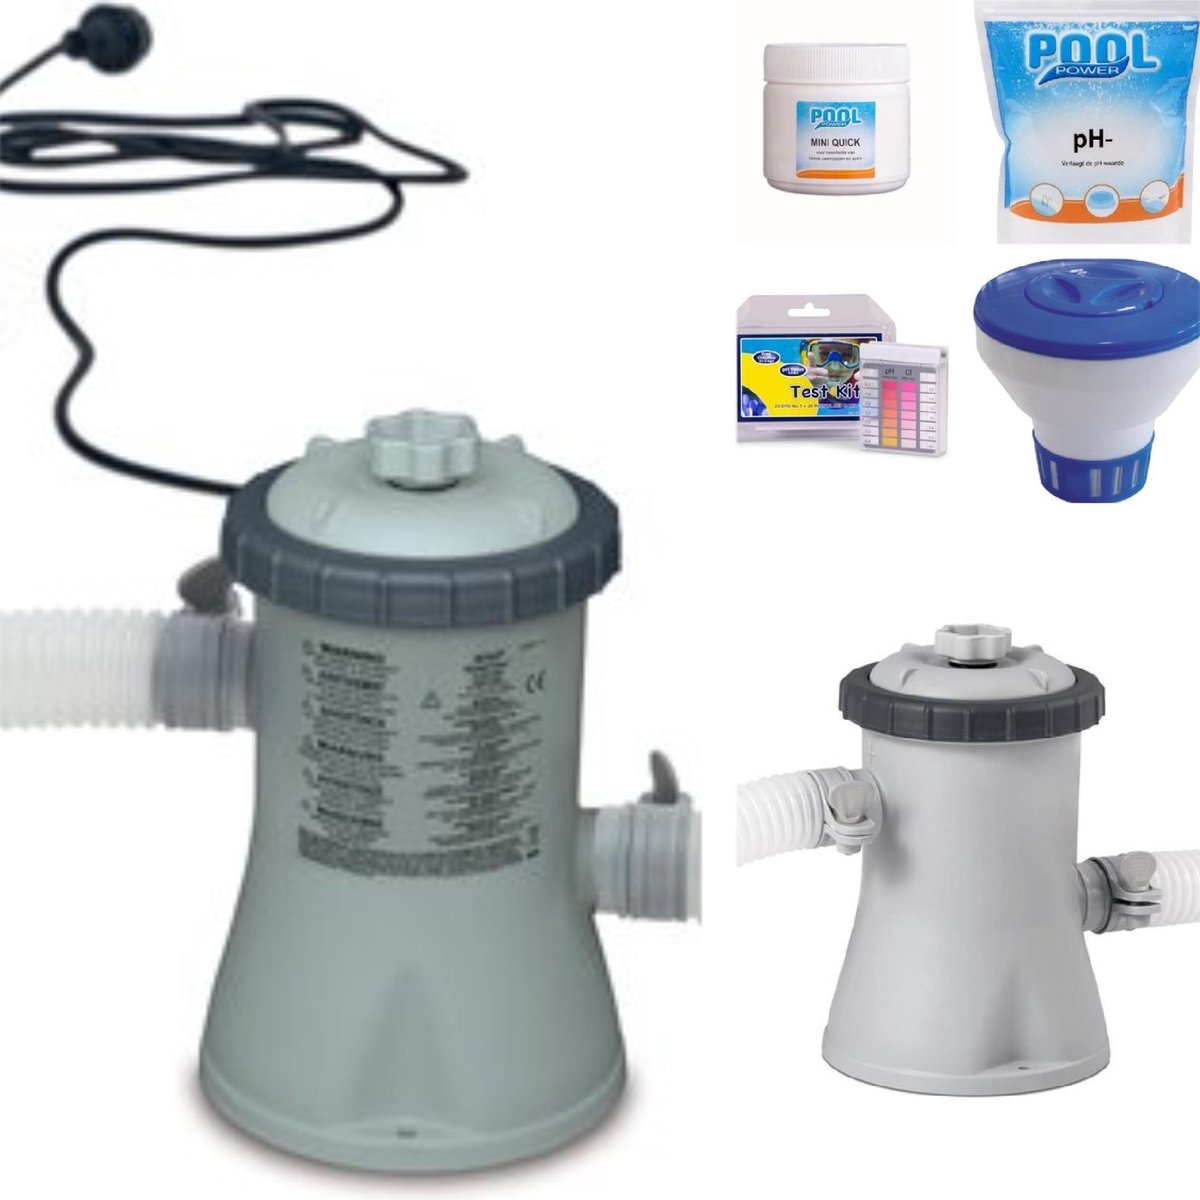 Intex Zwembad Filterpomp 12V - 1250 L/uur - Zwembad onderhoud reiniging Starterset mini Pool Power - pH- - Mini Quick chloor - Test Kit - Chloordrijver